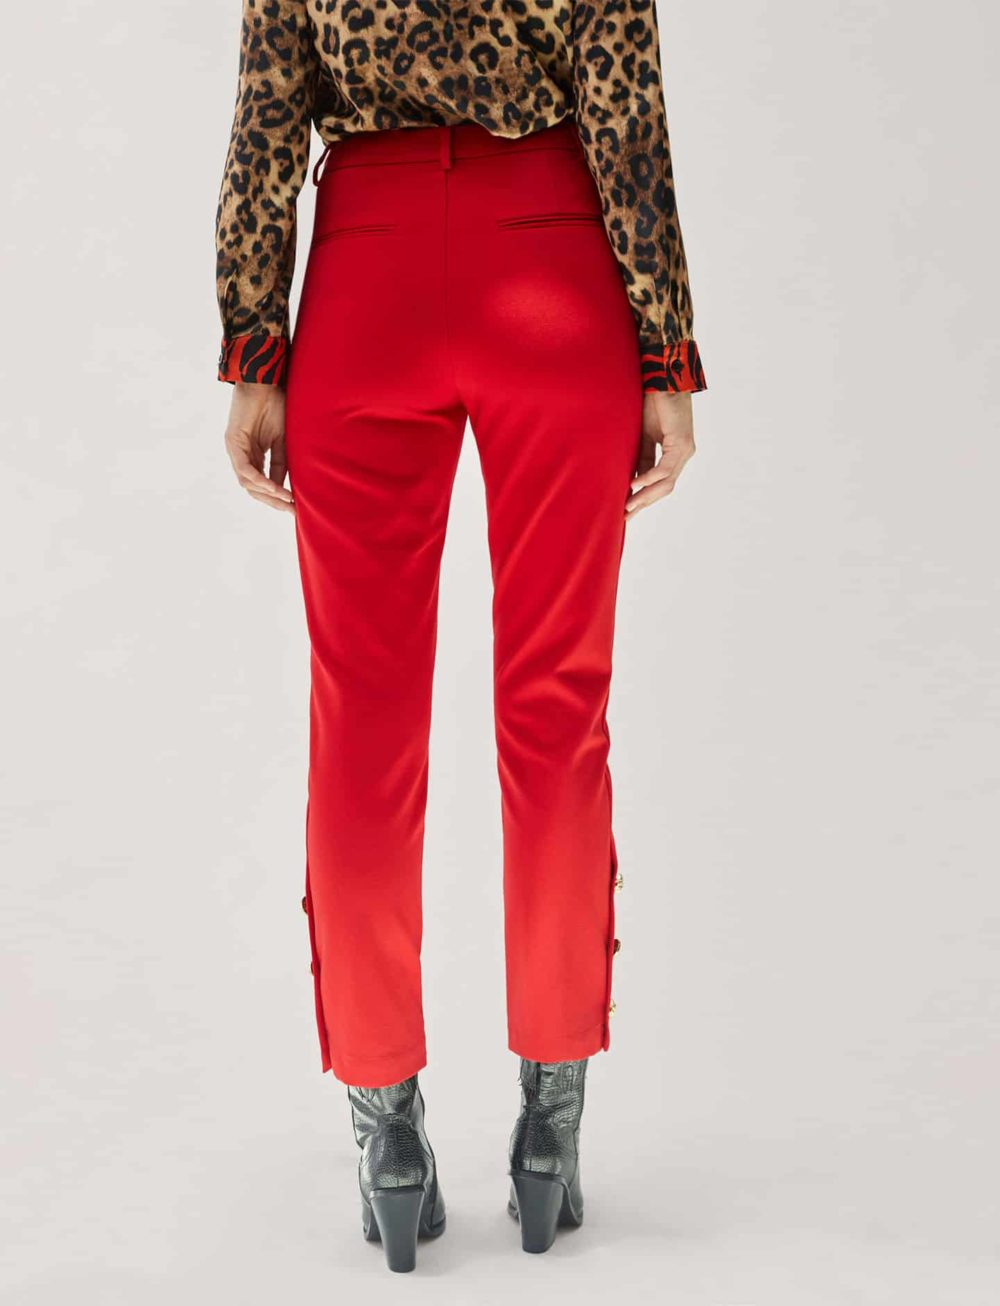 pantalon-chino-rojo-trasera